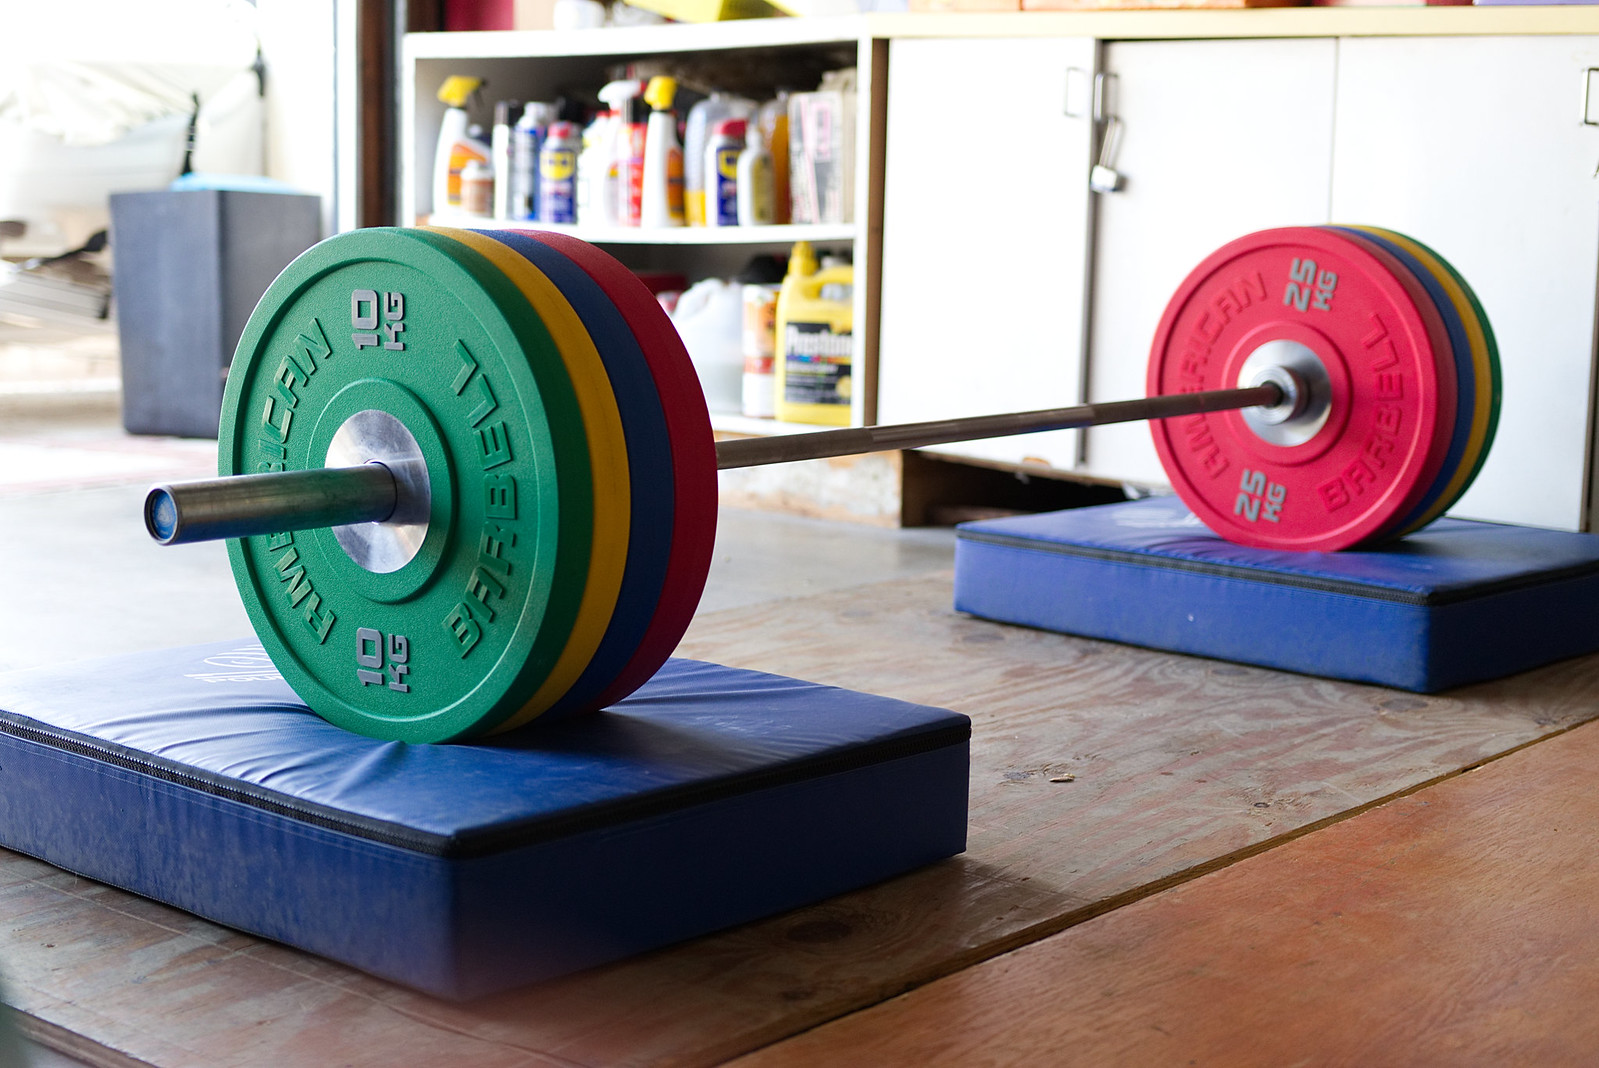 Gym equipmentas many reviews as possible